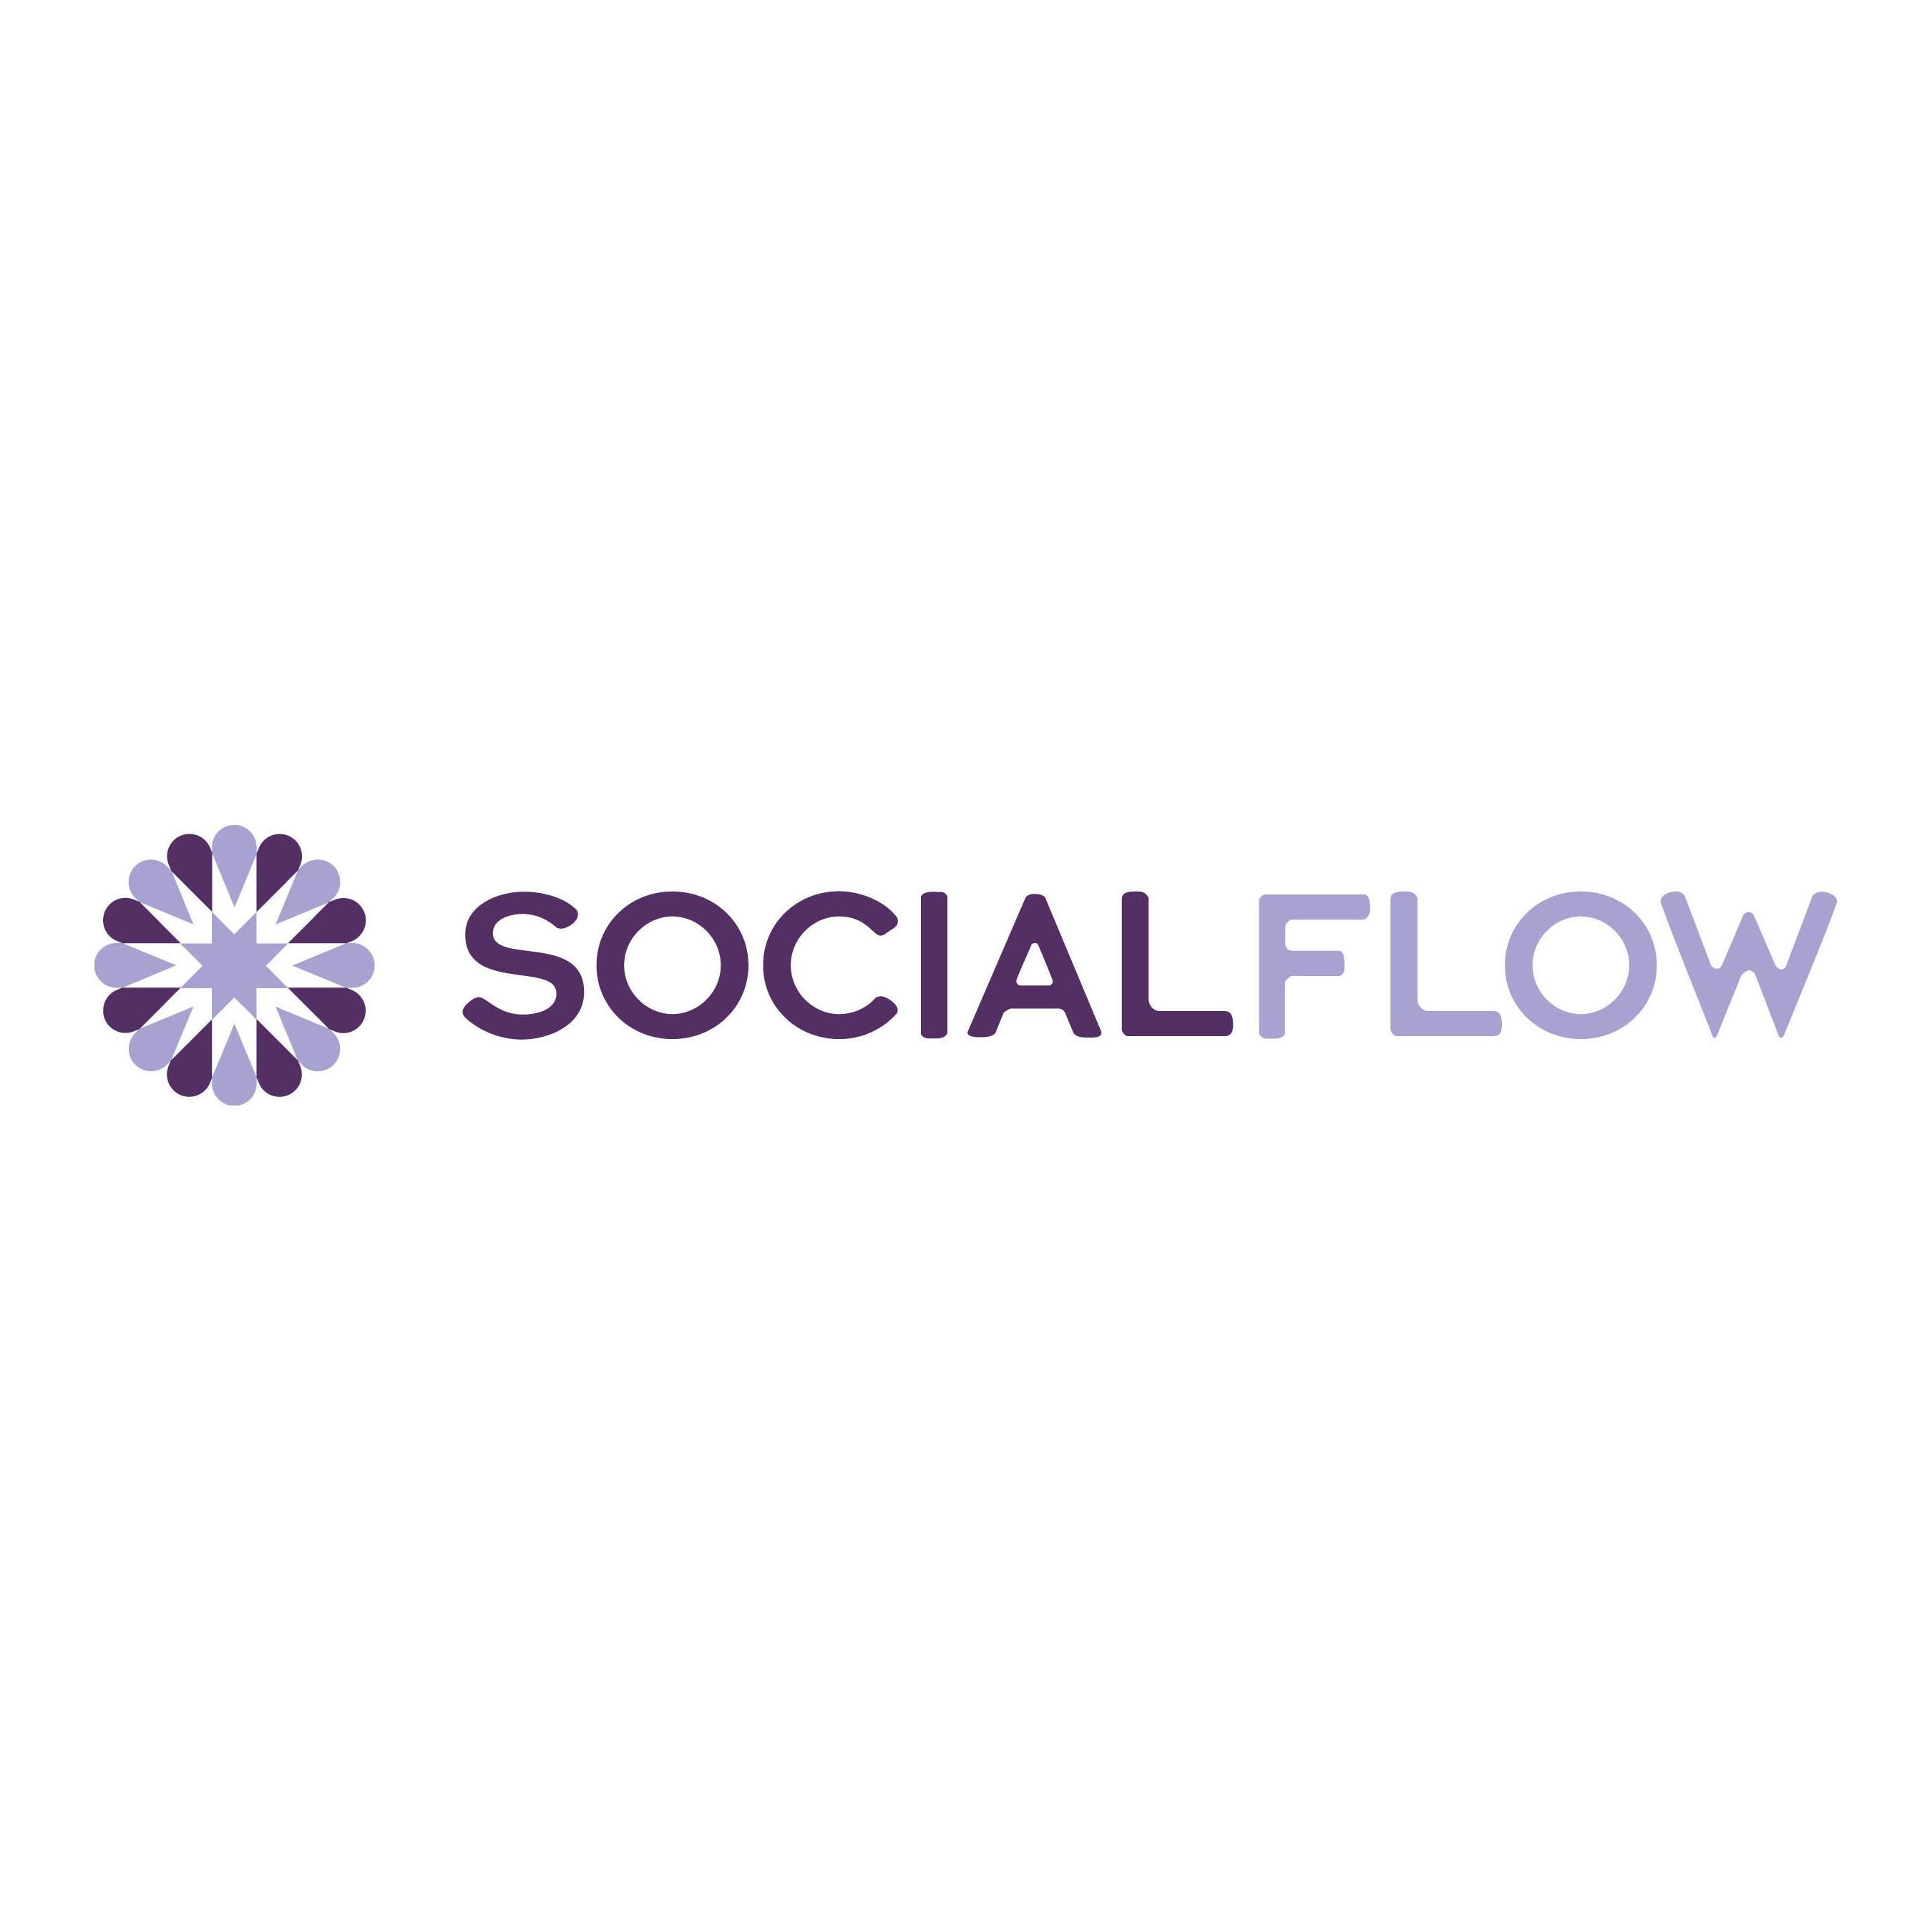 SocialFlow Offers Video Vault Uploader On Facebook